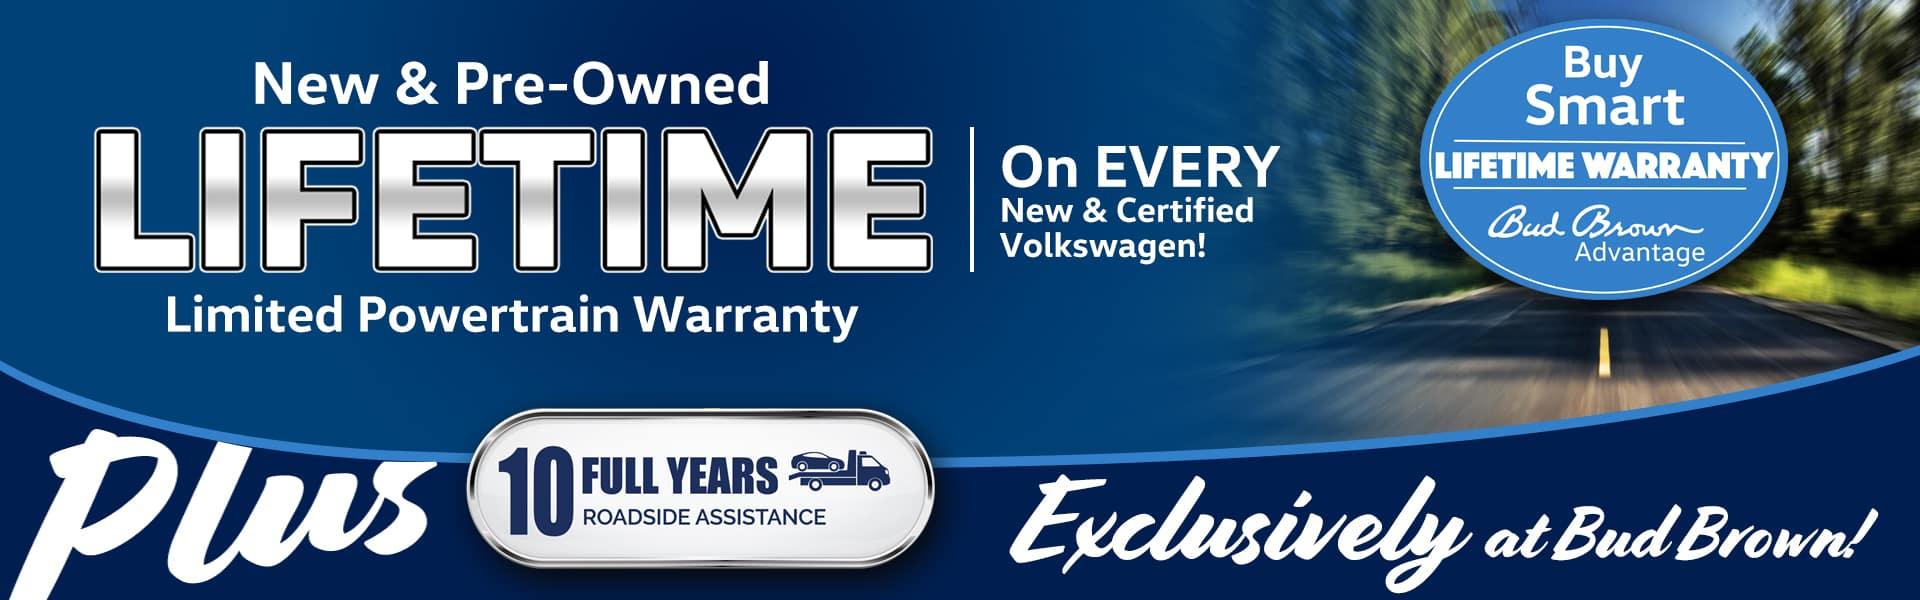 Bud Brown Advantage Lifetime Warranty